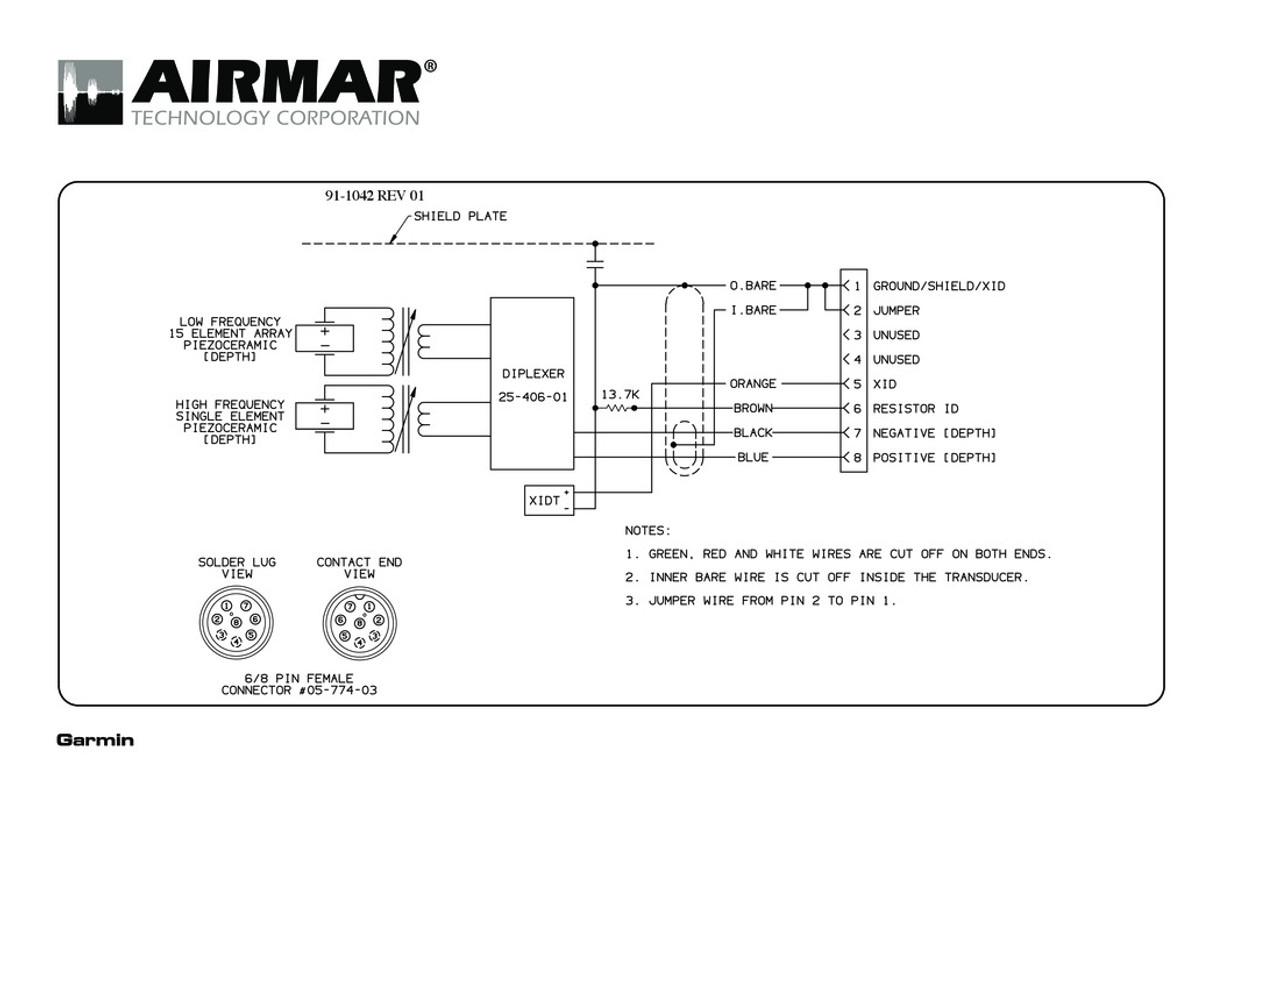 garmin fish finder wiring diagram explained wiring diagrams rh dmdelectro co